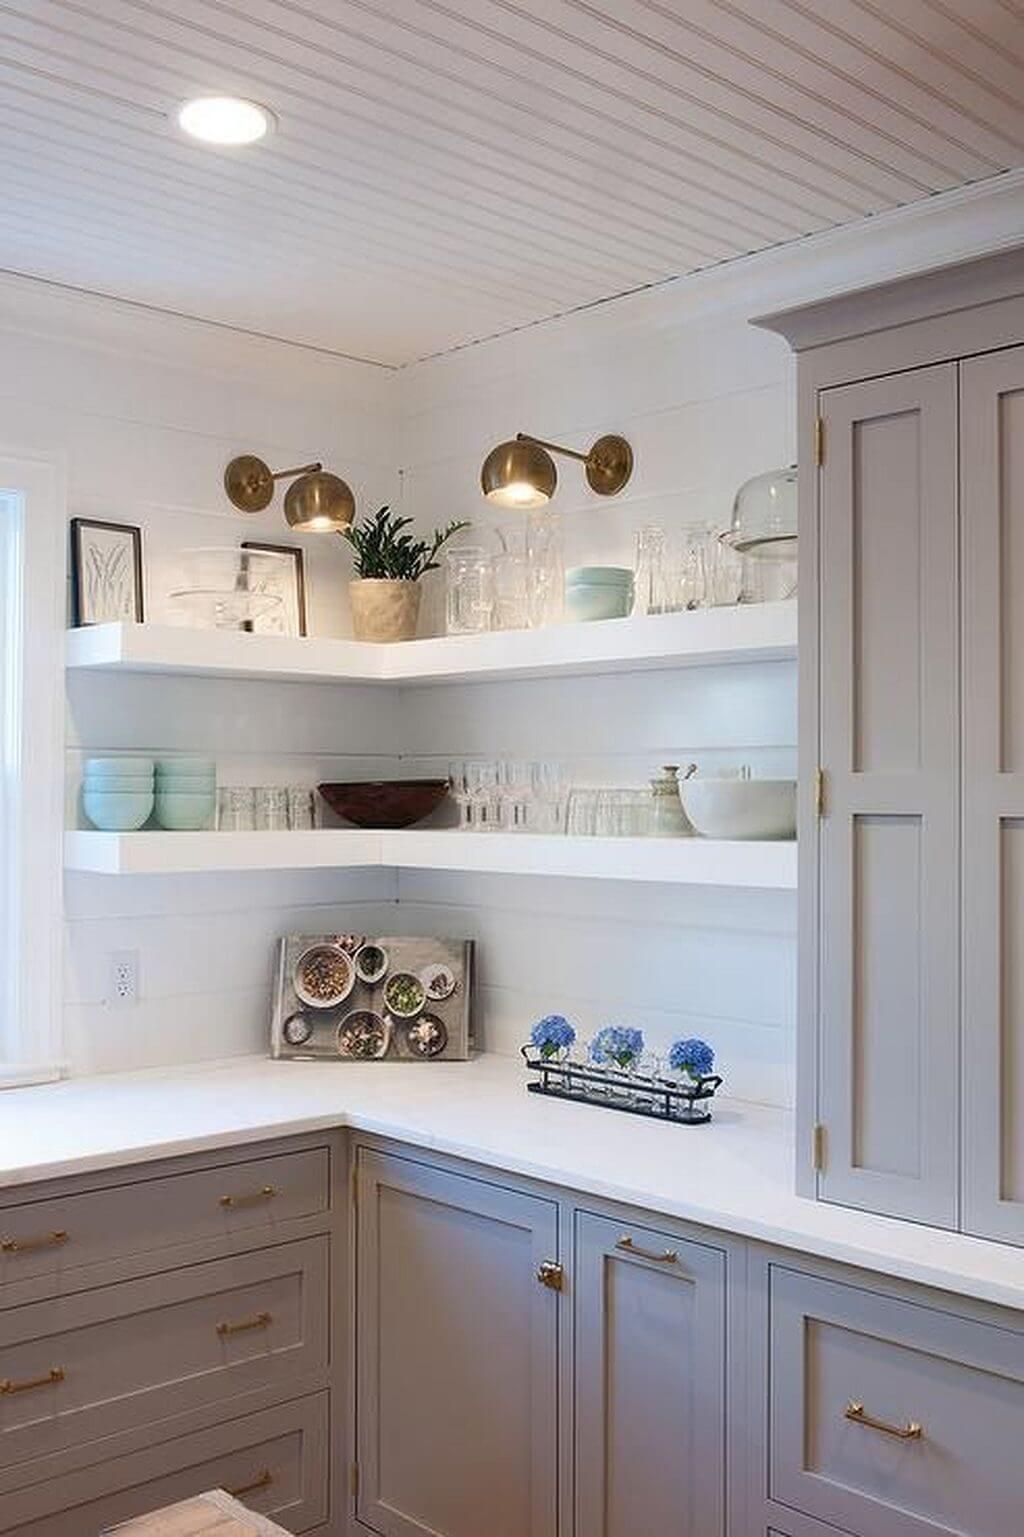 Chic kitchen shelf